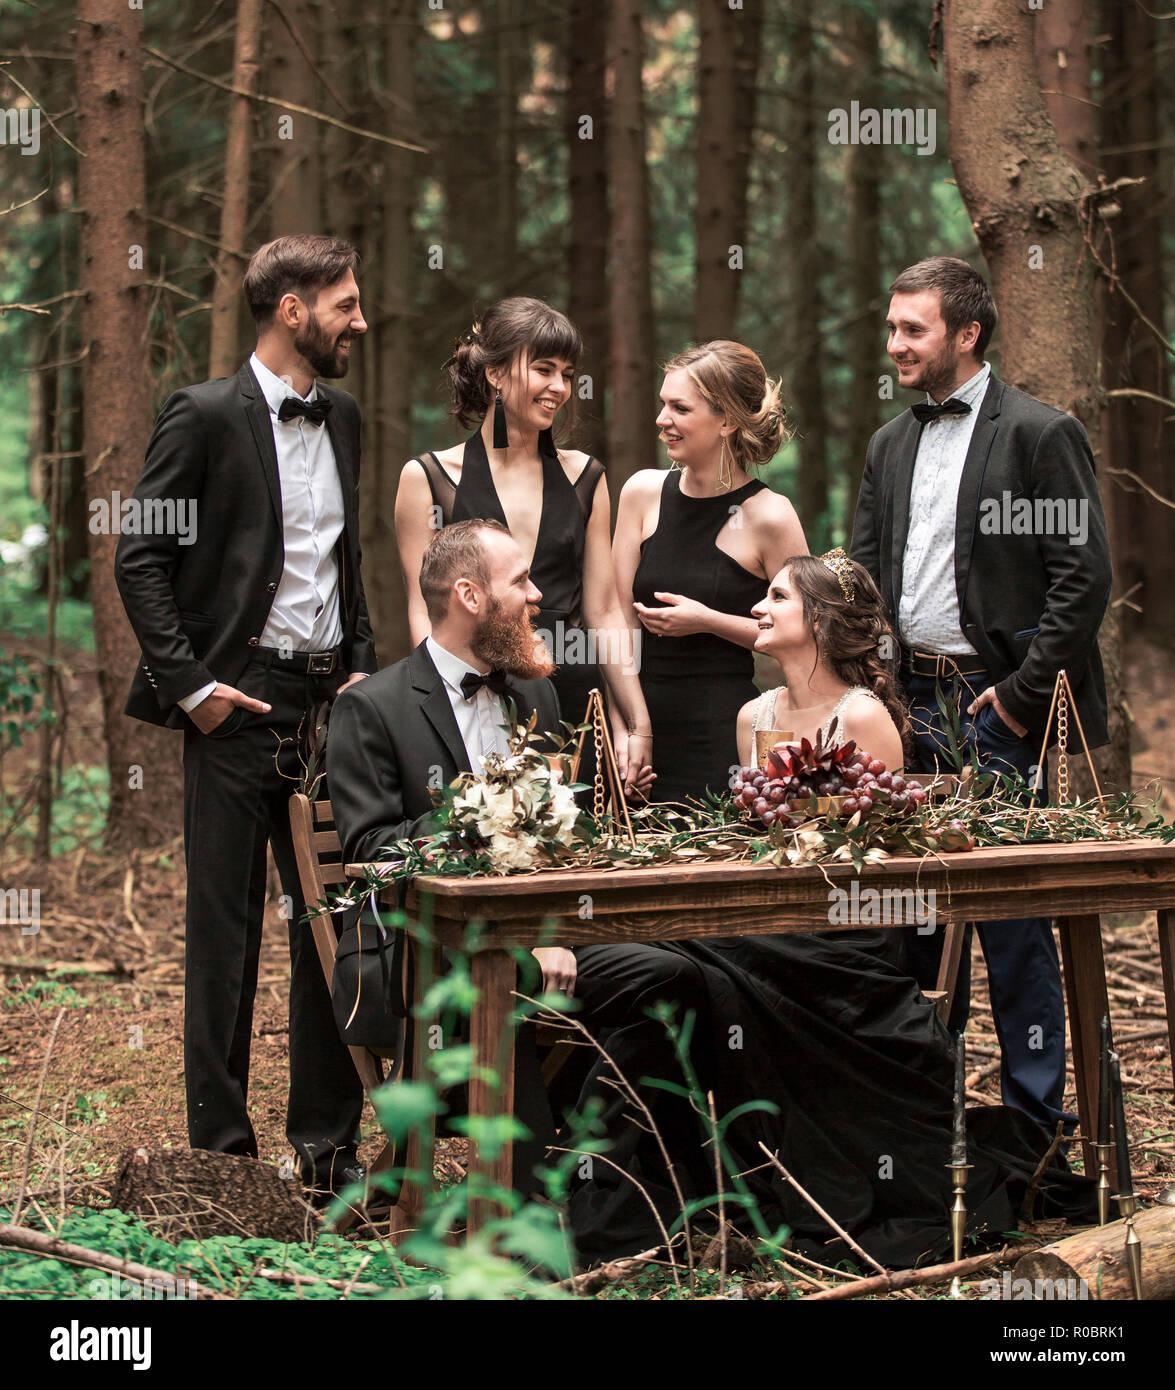 Unique Wedding Ideas Ceremony In The Woods: Unusual Wedding Ceremony Stock Photos & Unusual Wedding